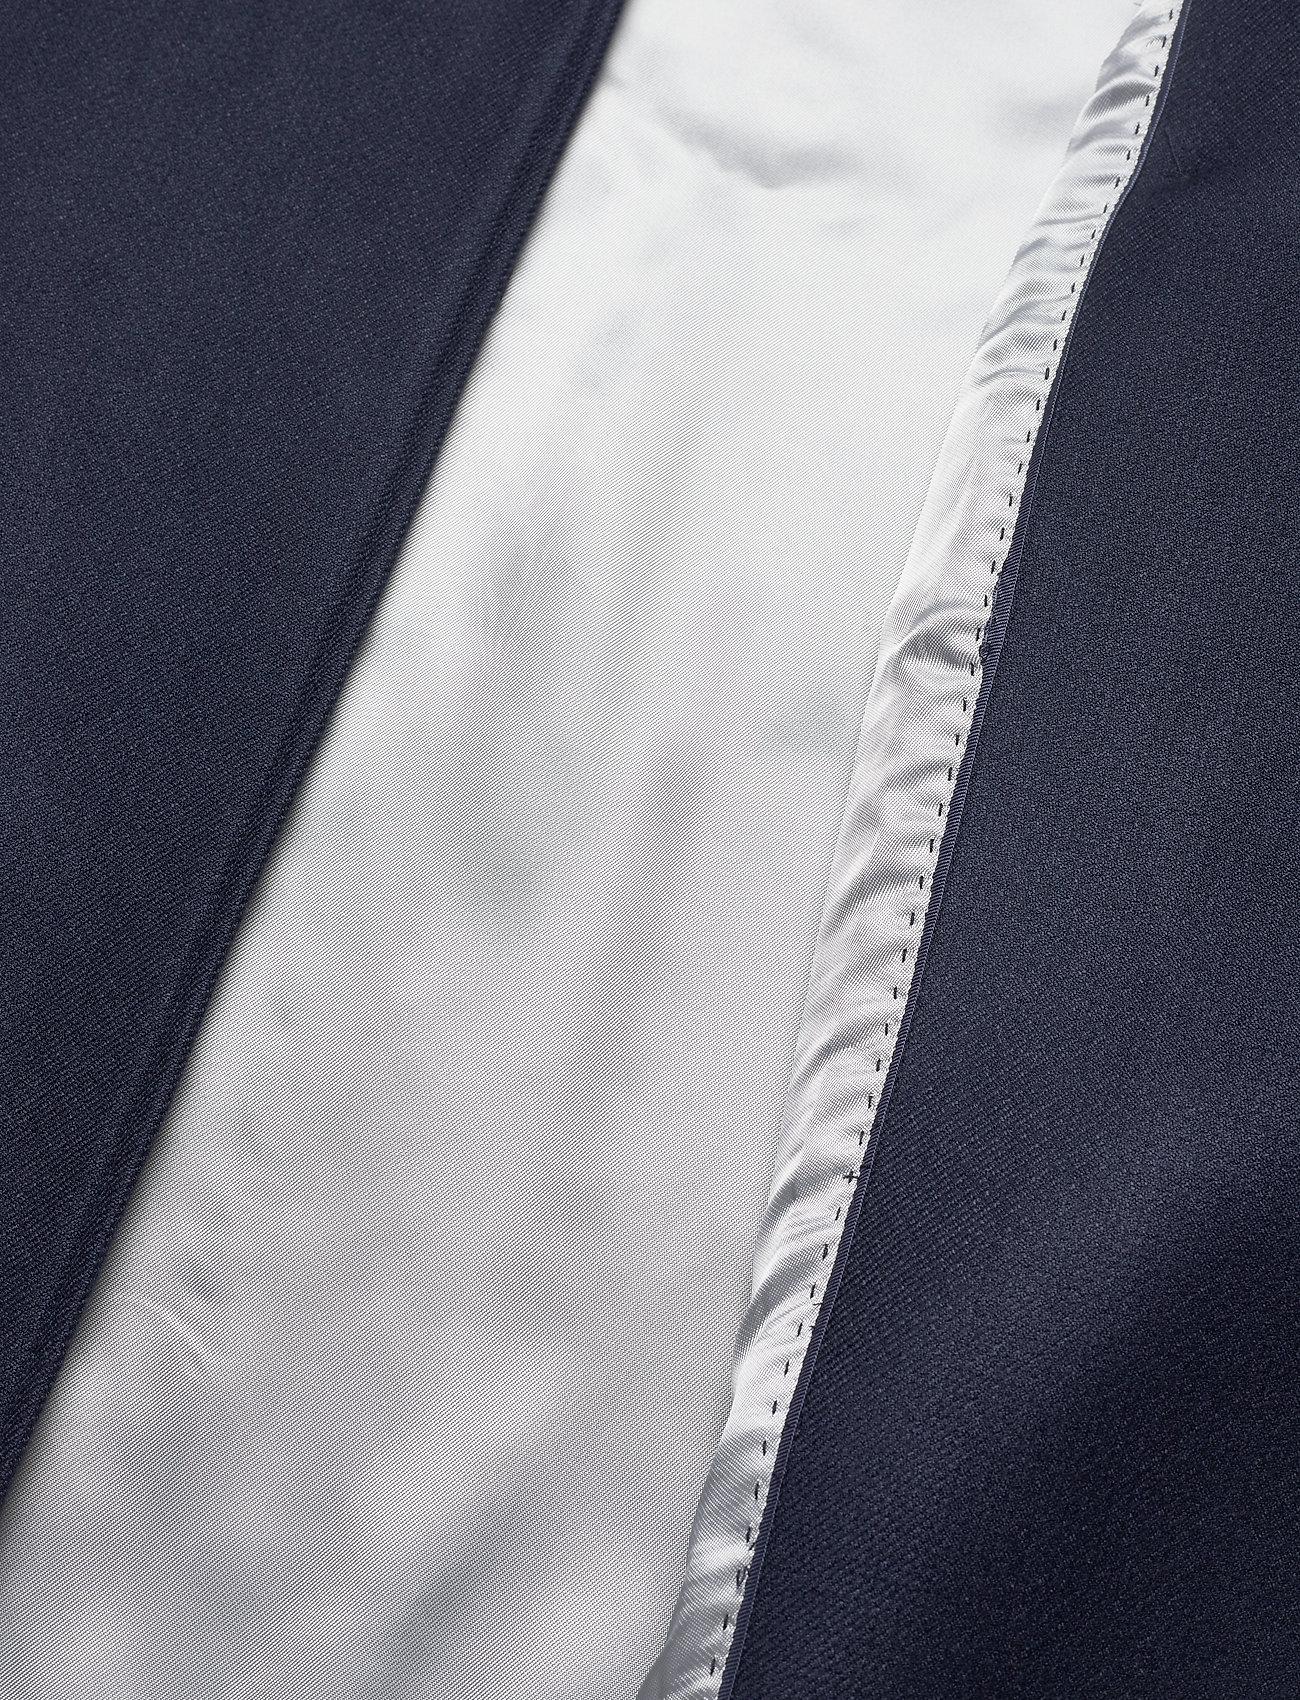 Robinne Coat (Navy) (259.35 €) - Morris Lady VHfsj